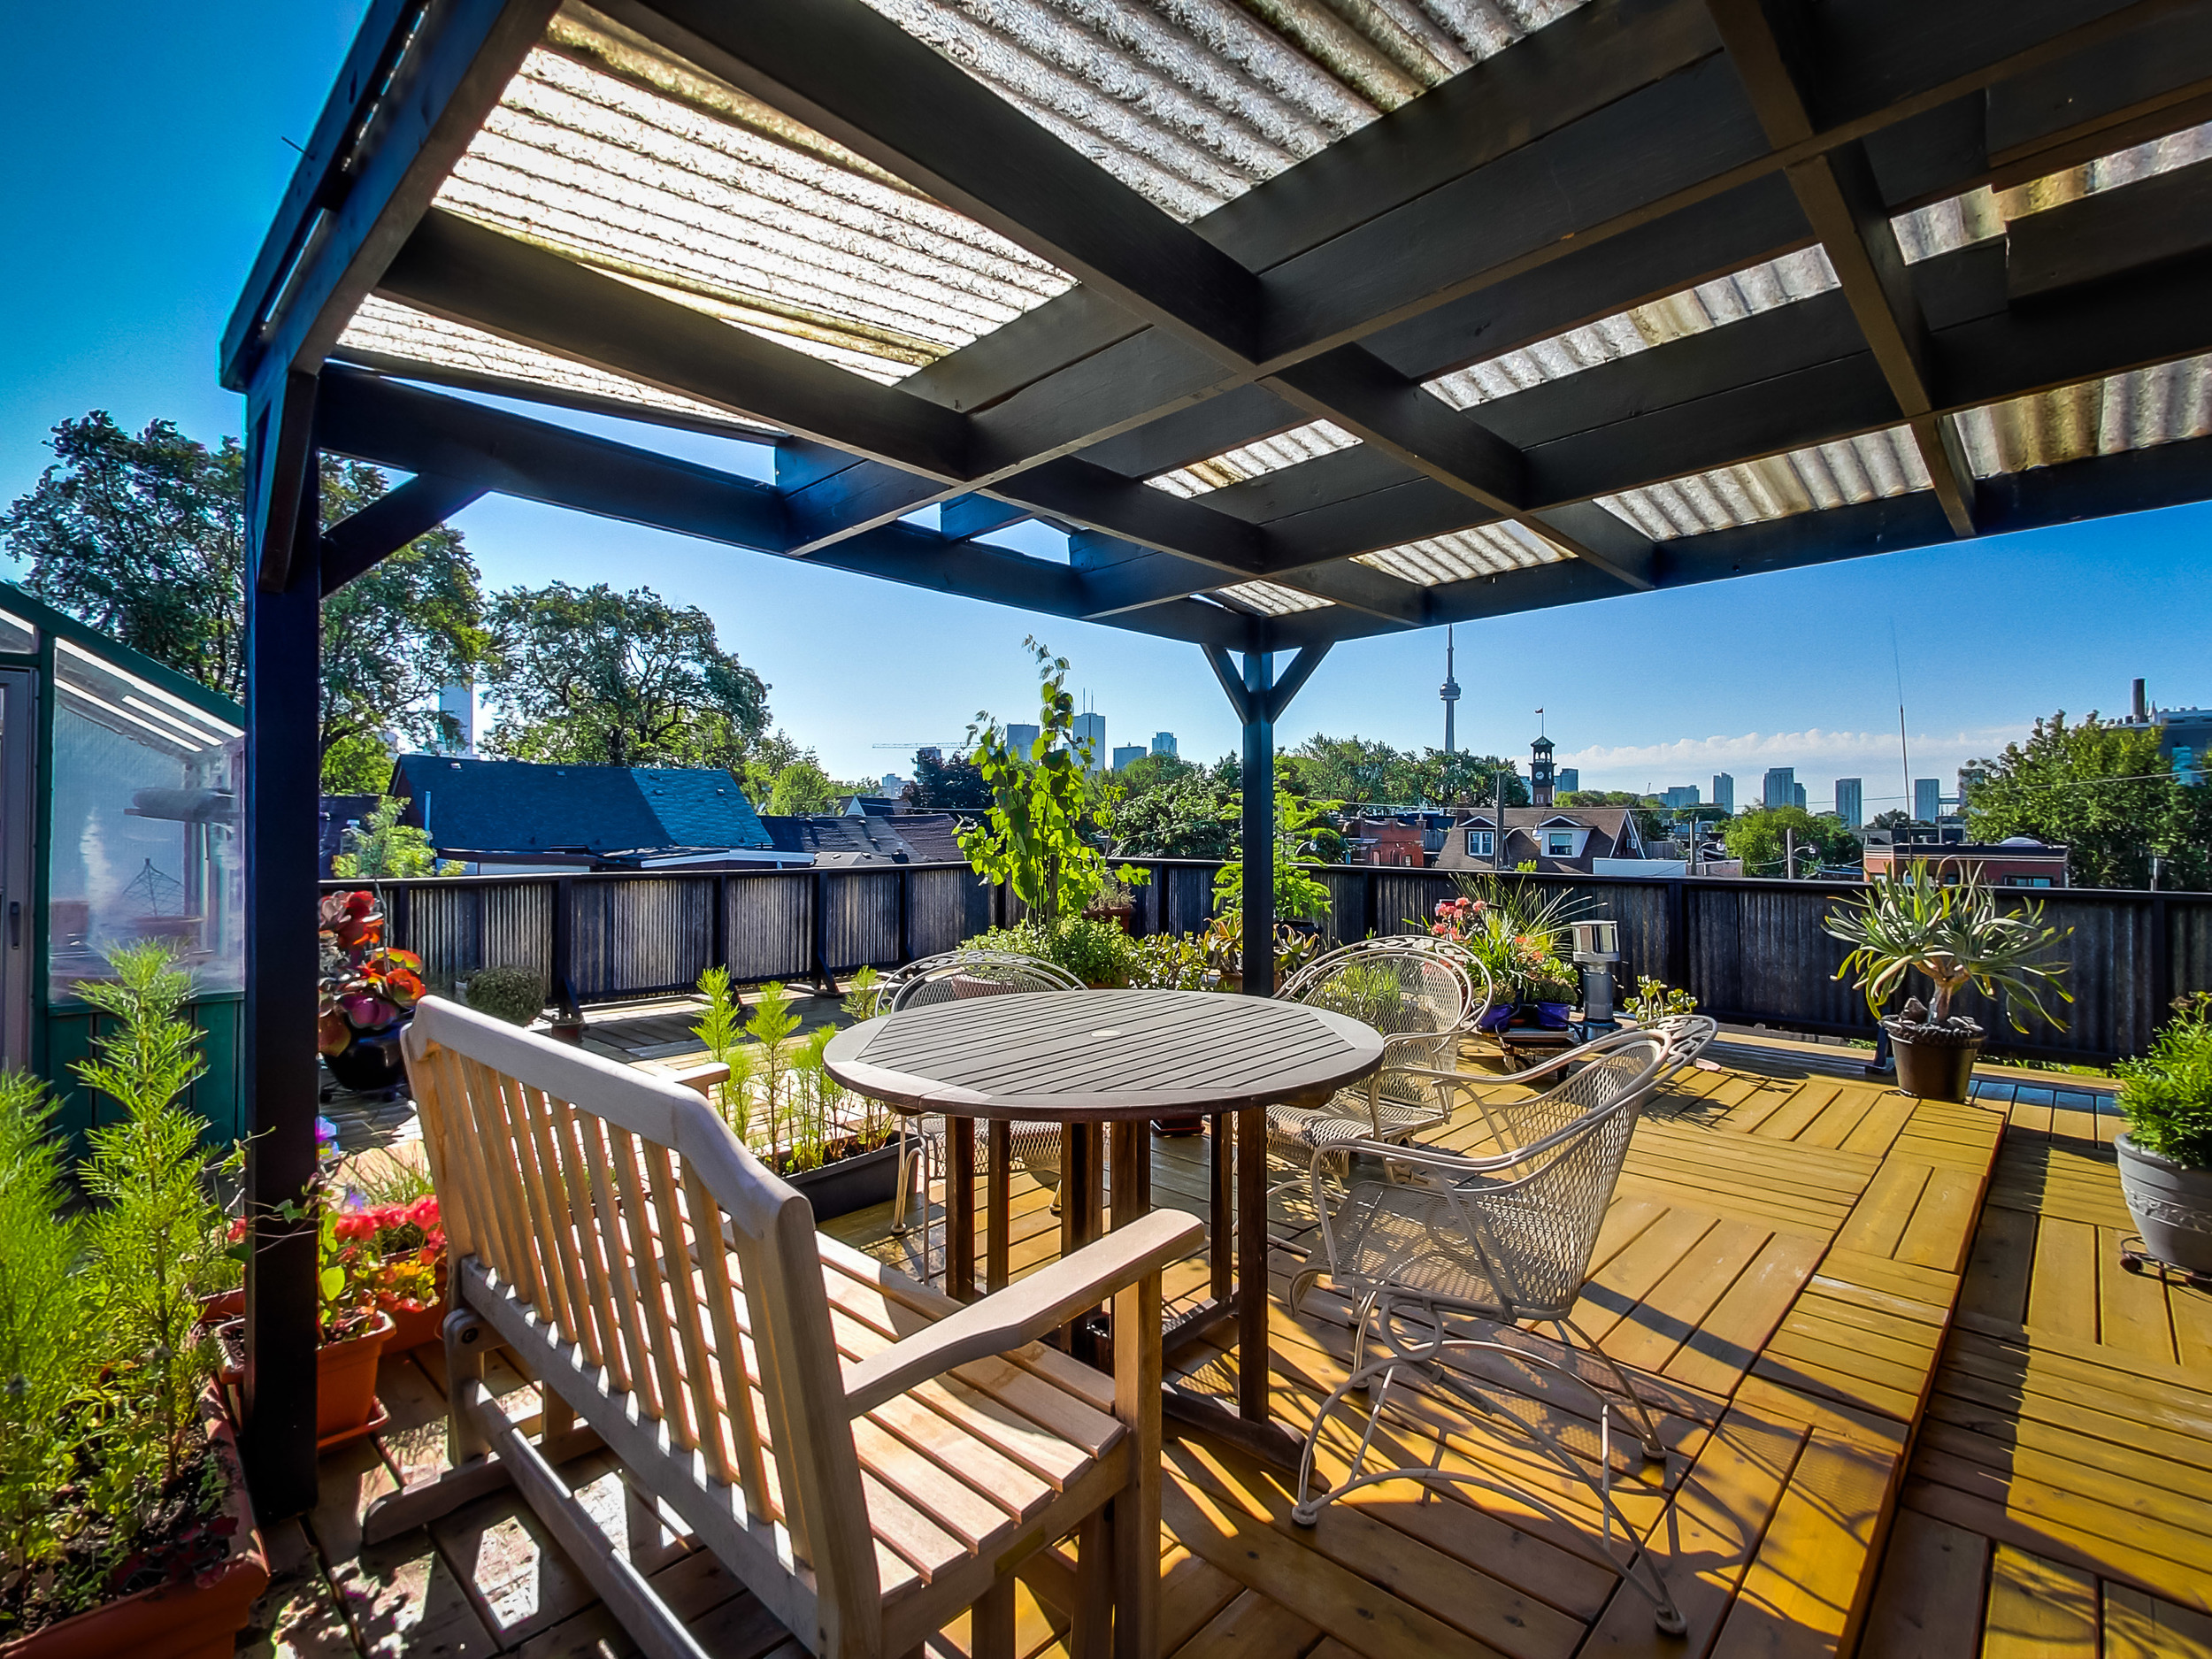 30'x30' Roof Terrace